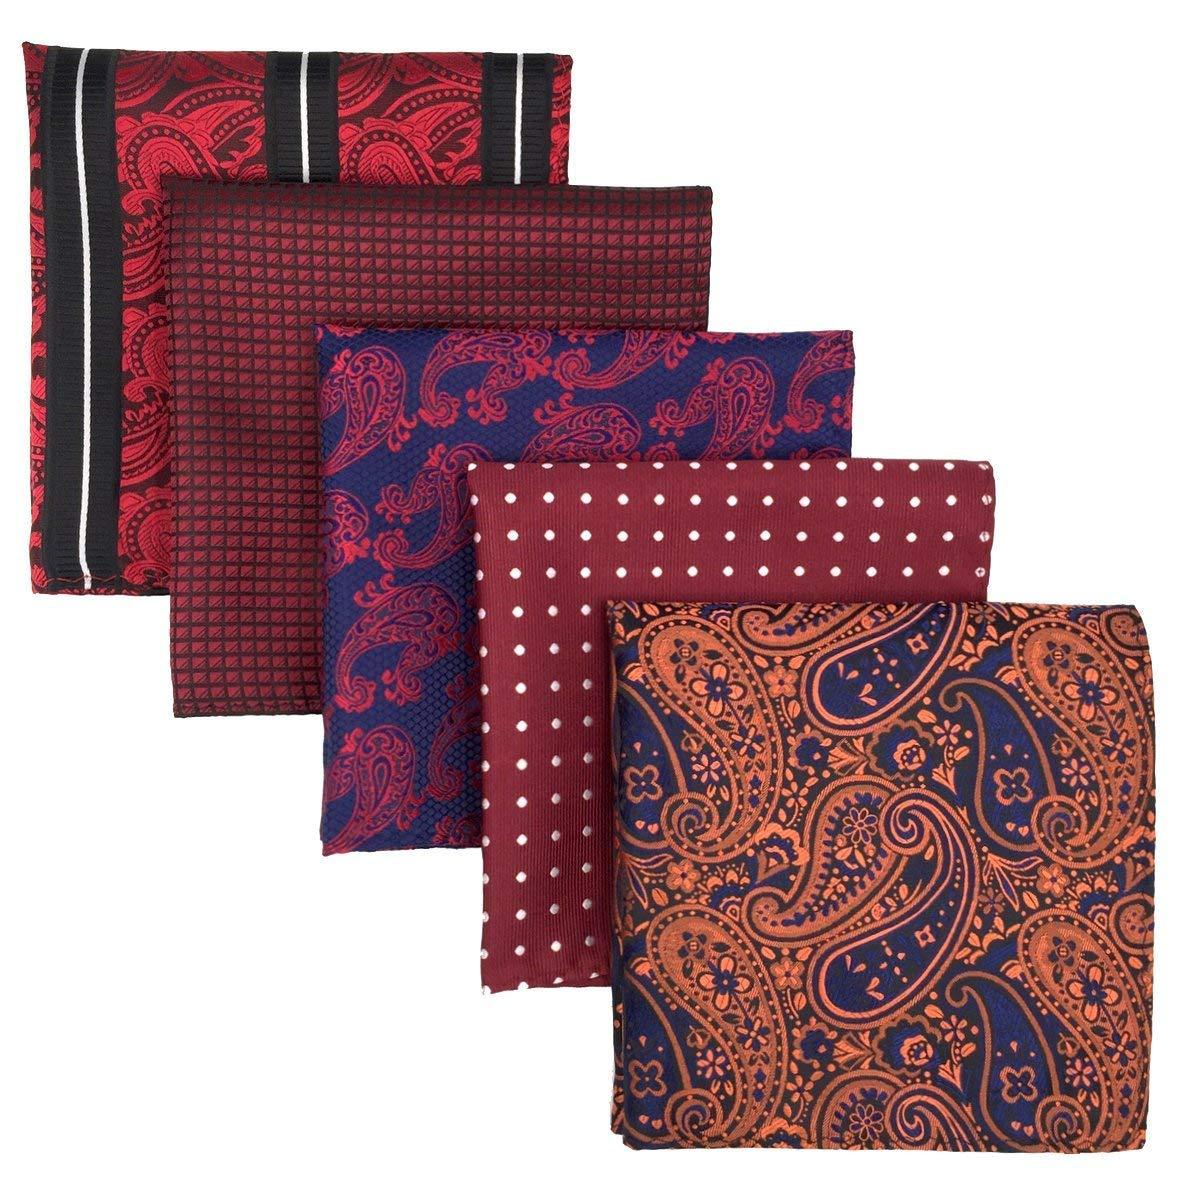 Shlax& Wing 5 Pieces Assorted Mens Pocket Square Handkerchiefs Set HSET-2